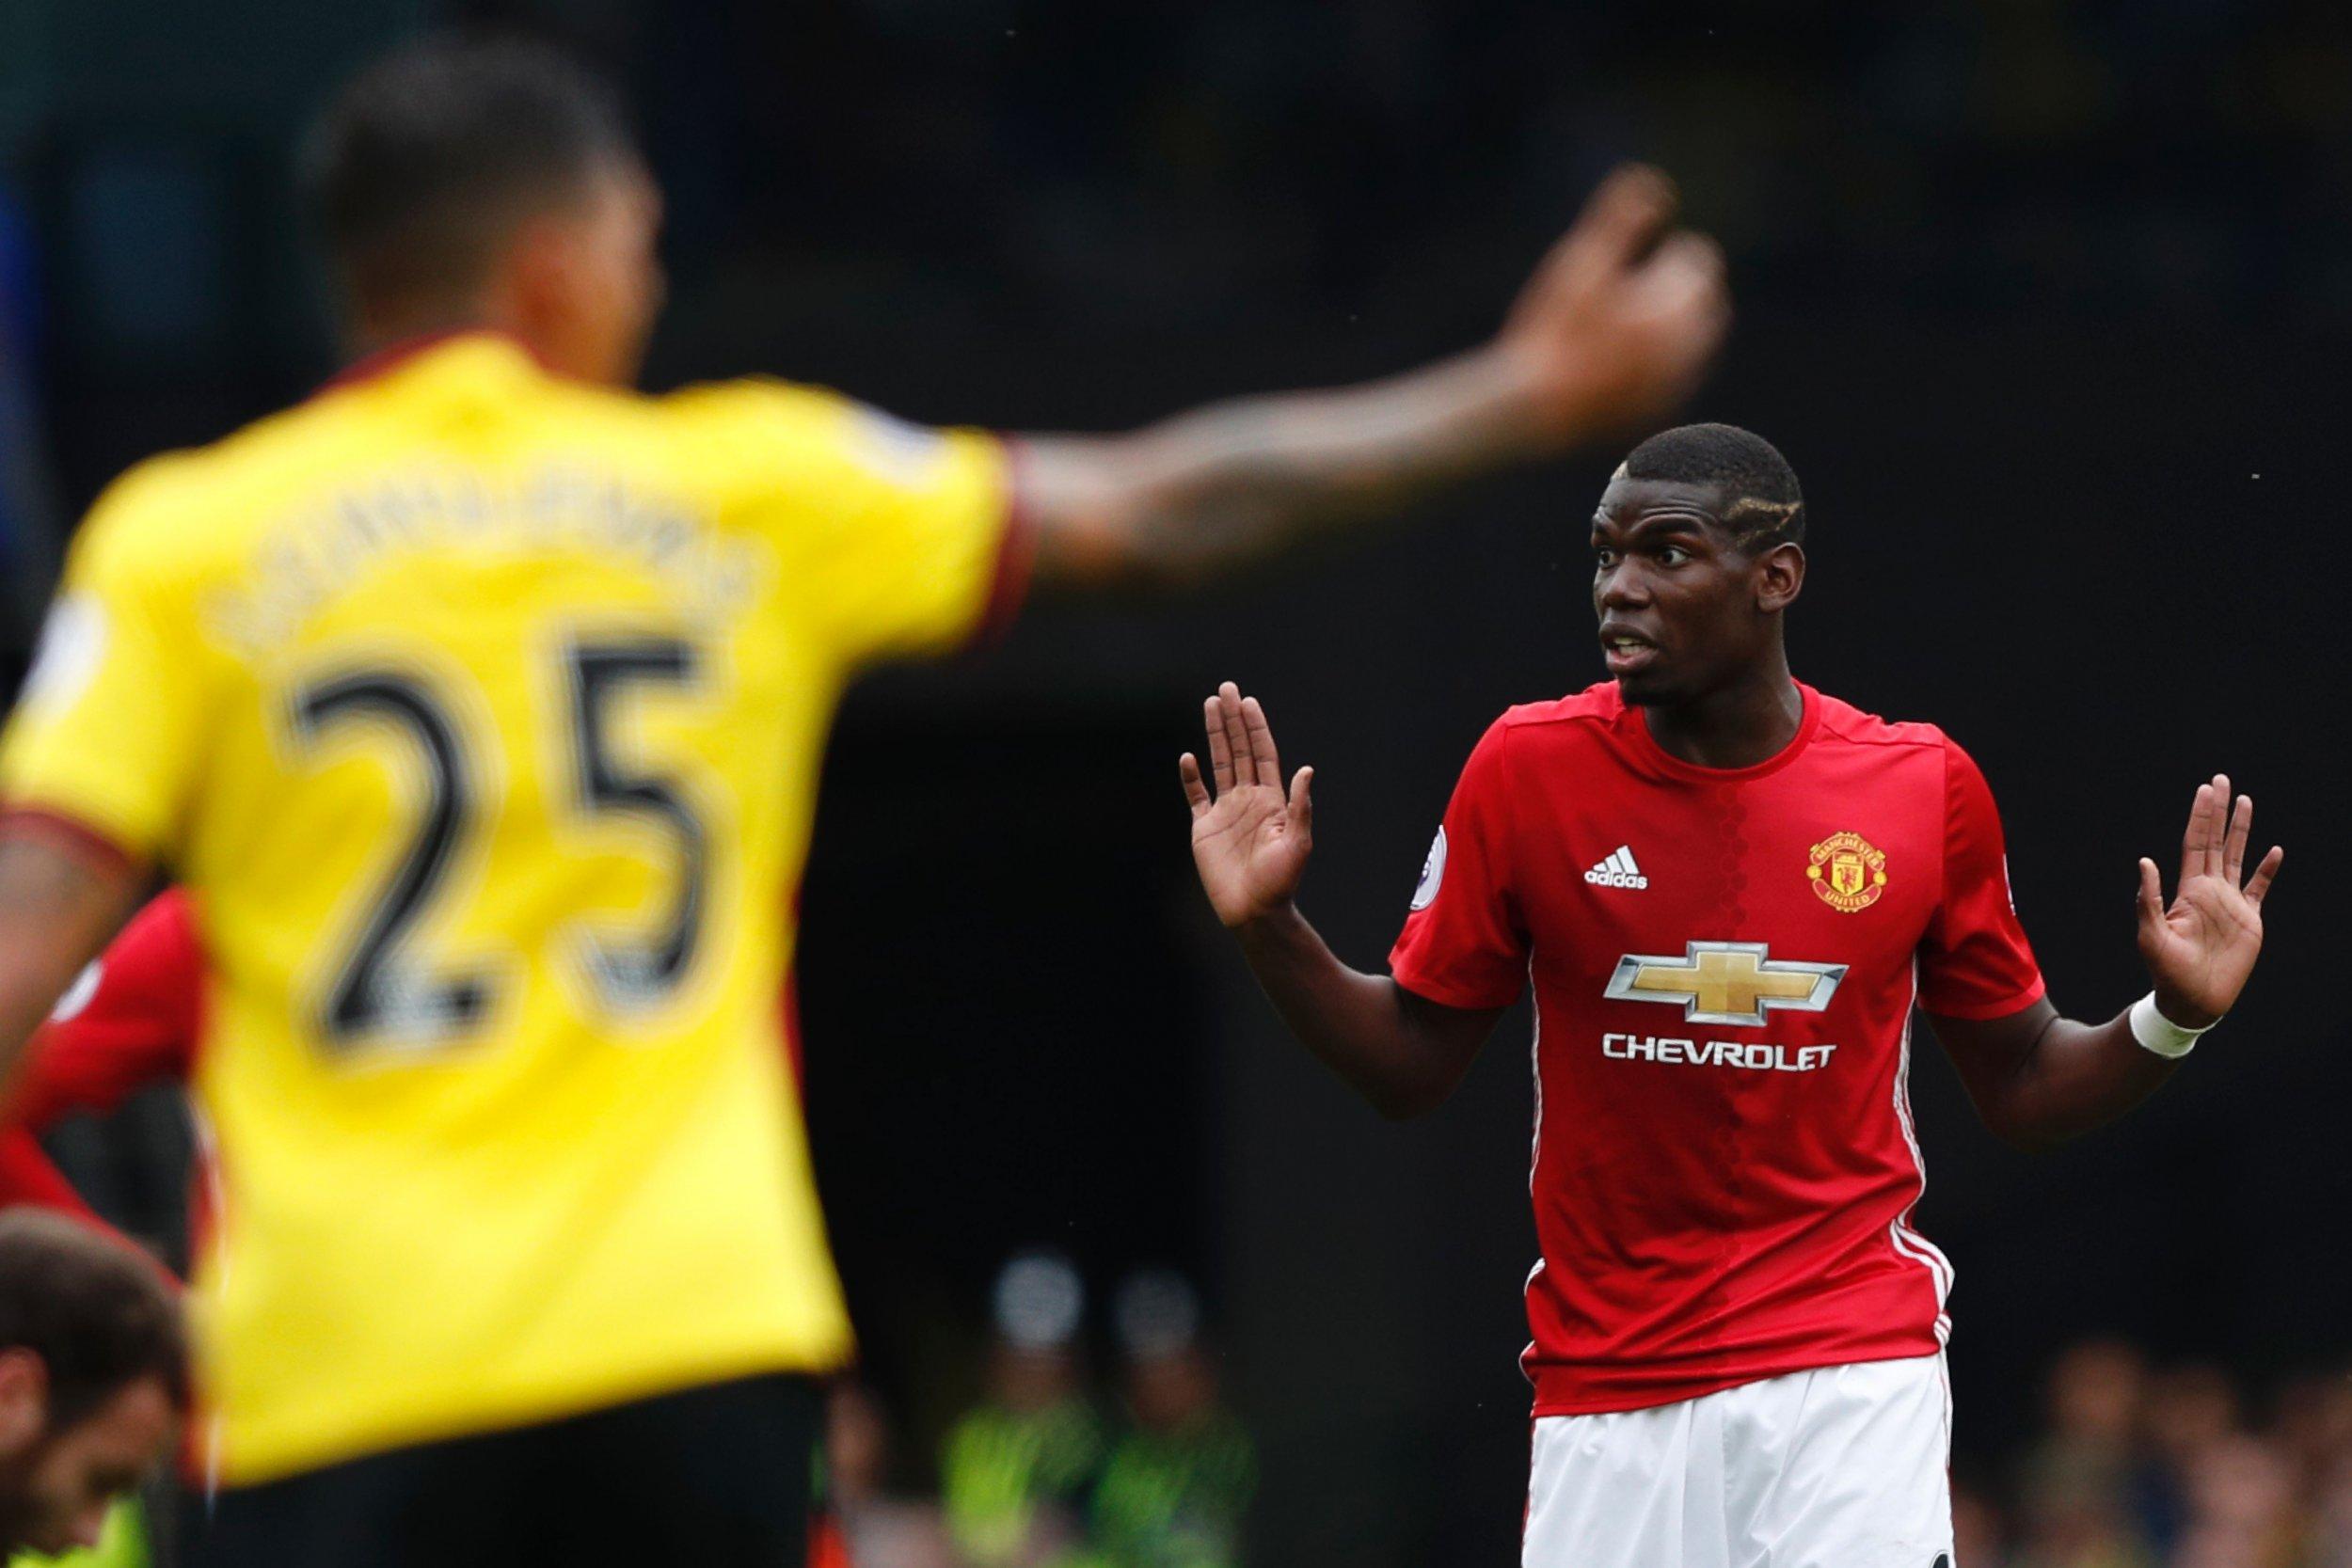 Paul Pogba: Manchester United Star Is Below Par, Admits Agent Mino Raiola